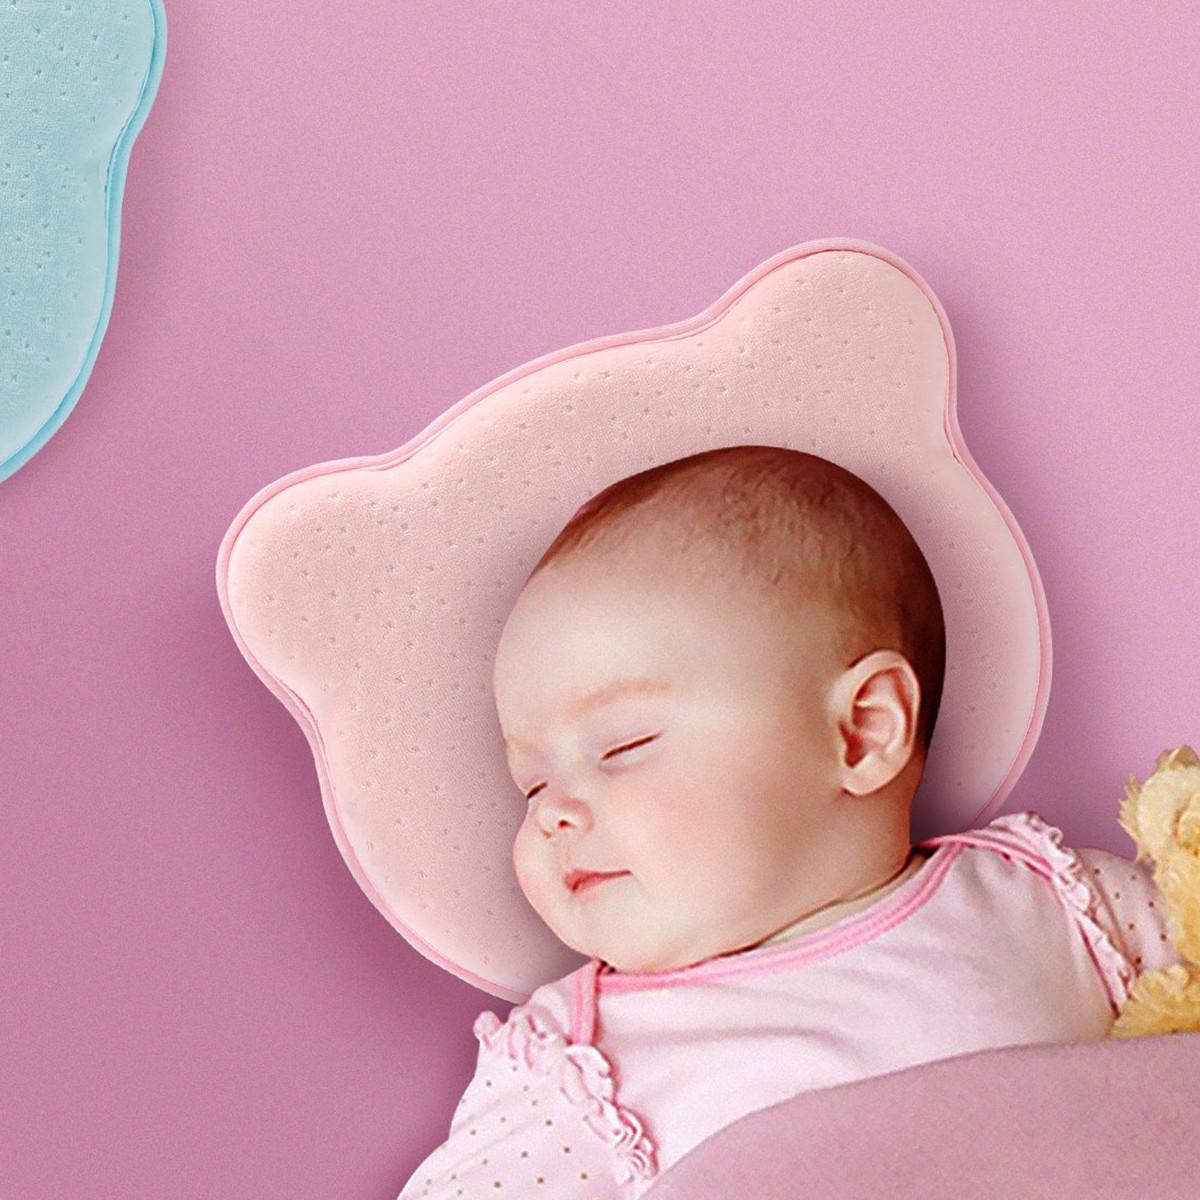 Ramada天鹅绒宝宝新生儿预防偏头记忆棉婴儿午睡定型枕儿童枕头枕芯KPL171002-02